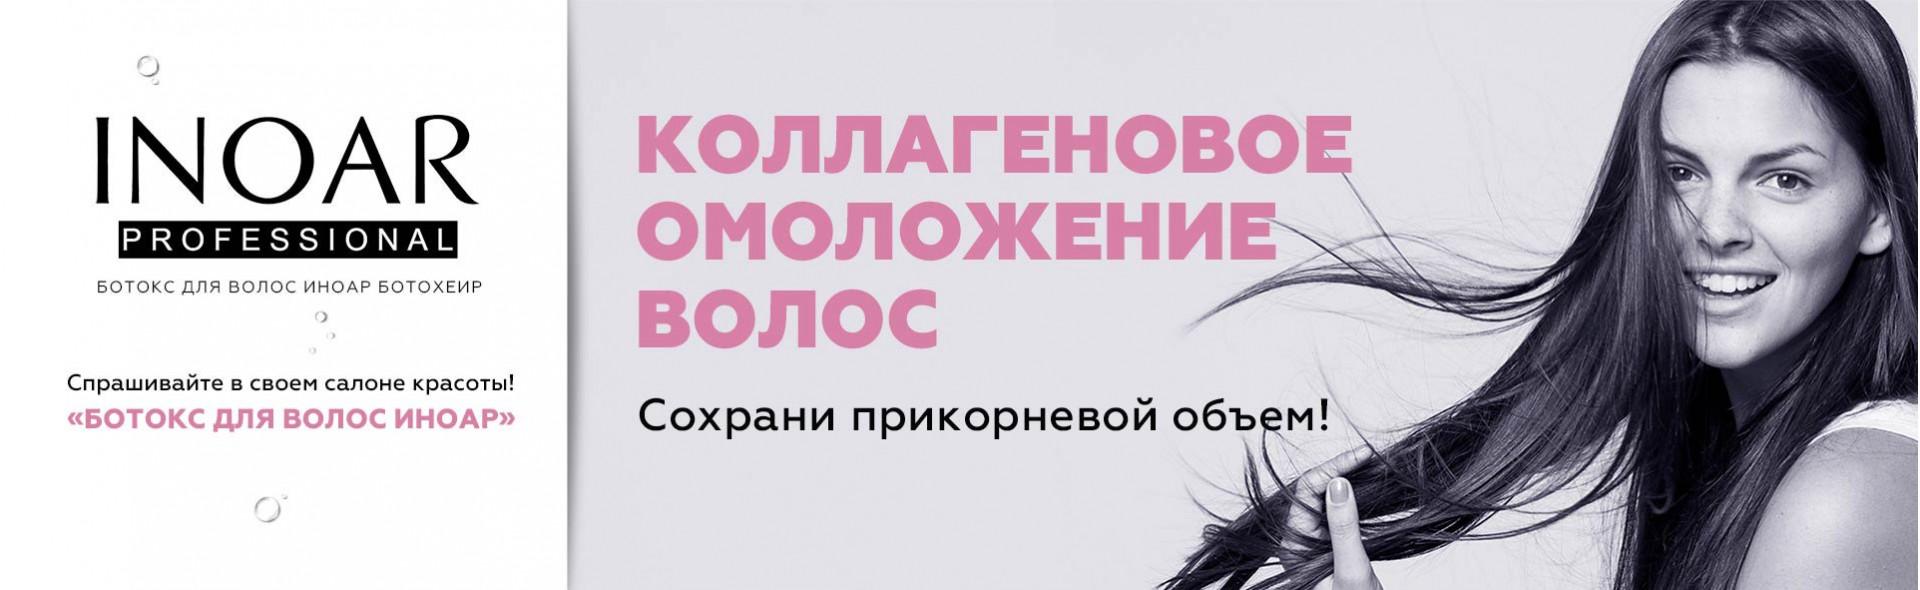 Botohair Keratine Slide 2 Inoar Ukraine